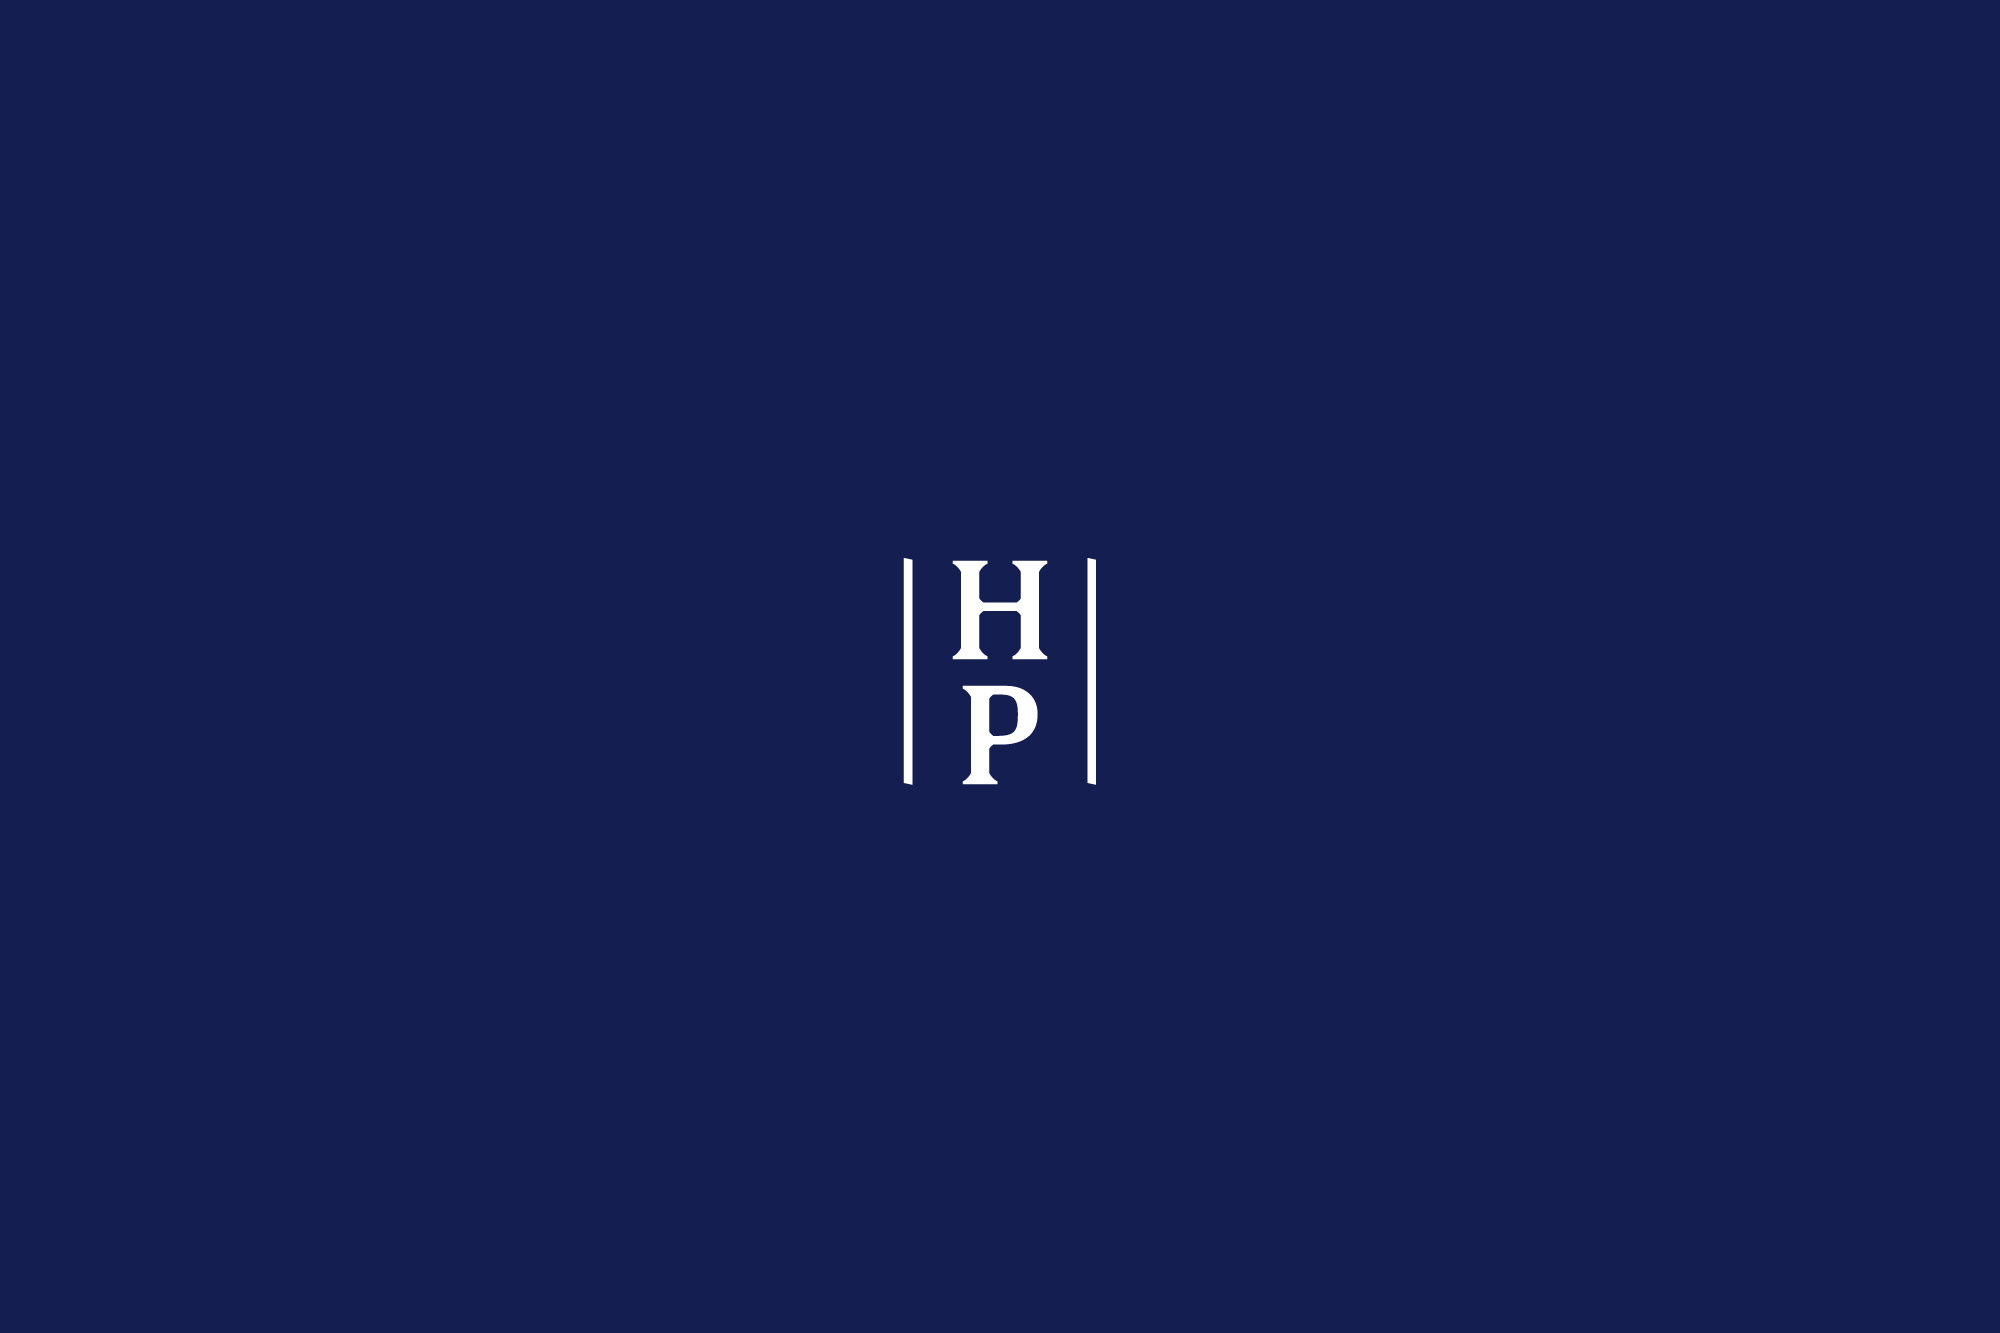 Hurley_Partnerships_Website_080420_4